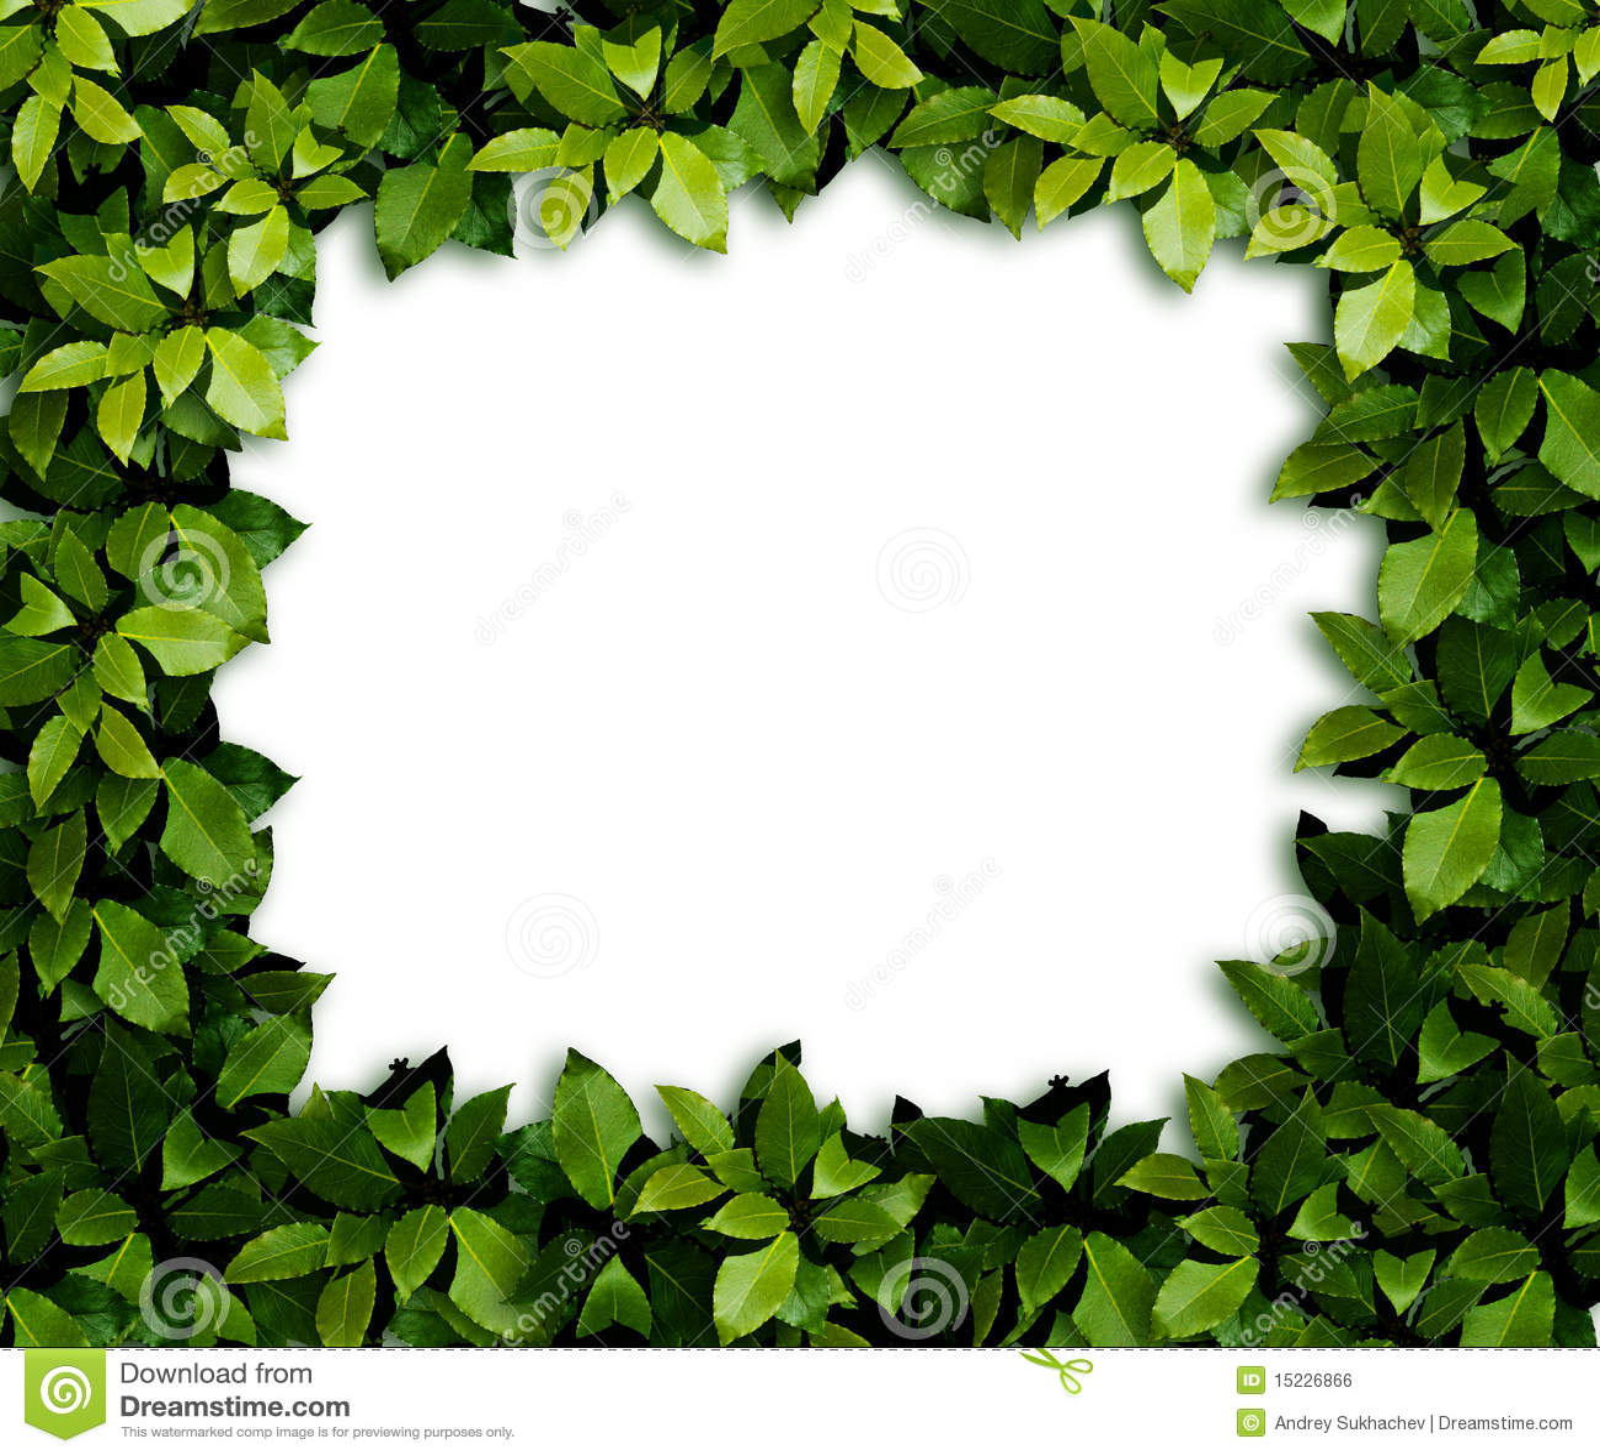 Leaves Background Royalty Free Stock Image - Image: 15226866